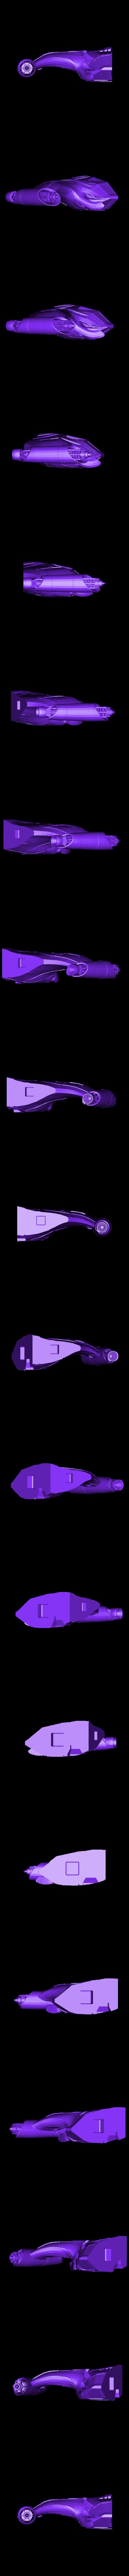 Lucy_R_01.stl Download free STL file Killjoys - Lucy • 3D printer template, SYFY